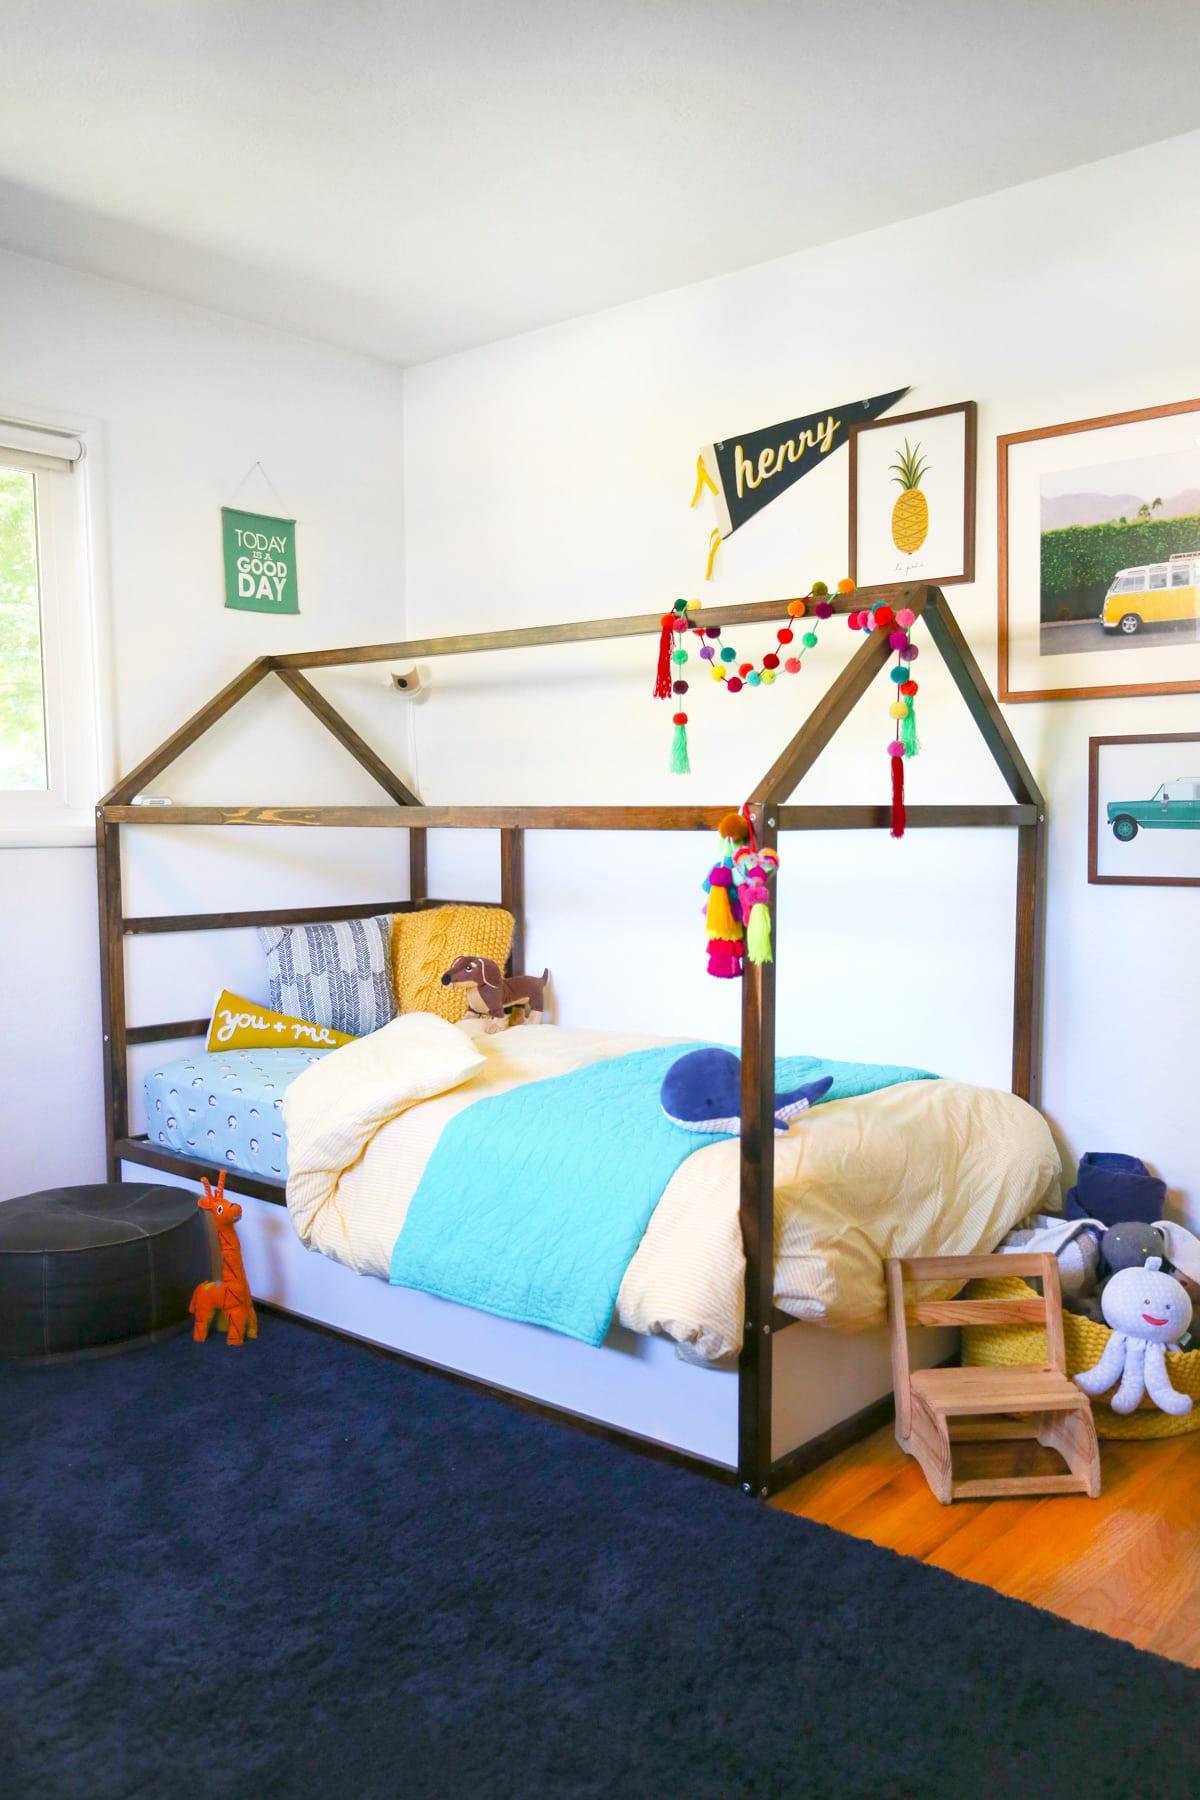 Full Size of Kura Hack Ikea Bed Storage Underneath Bunk 2 Beds Montessori Double Diy Lovely Indeed Wohnzimmer Kura Hack